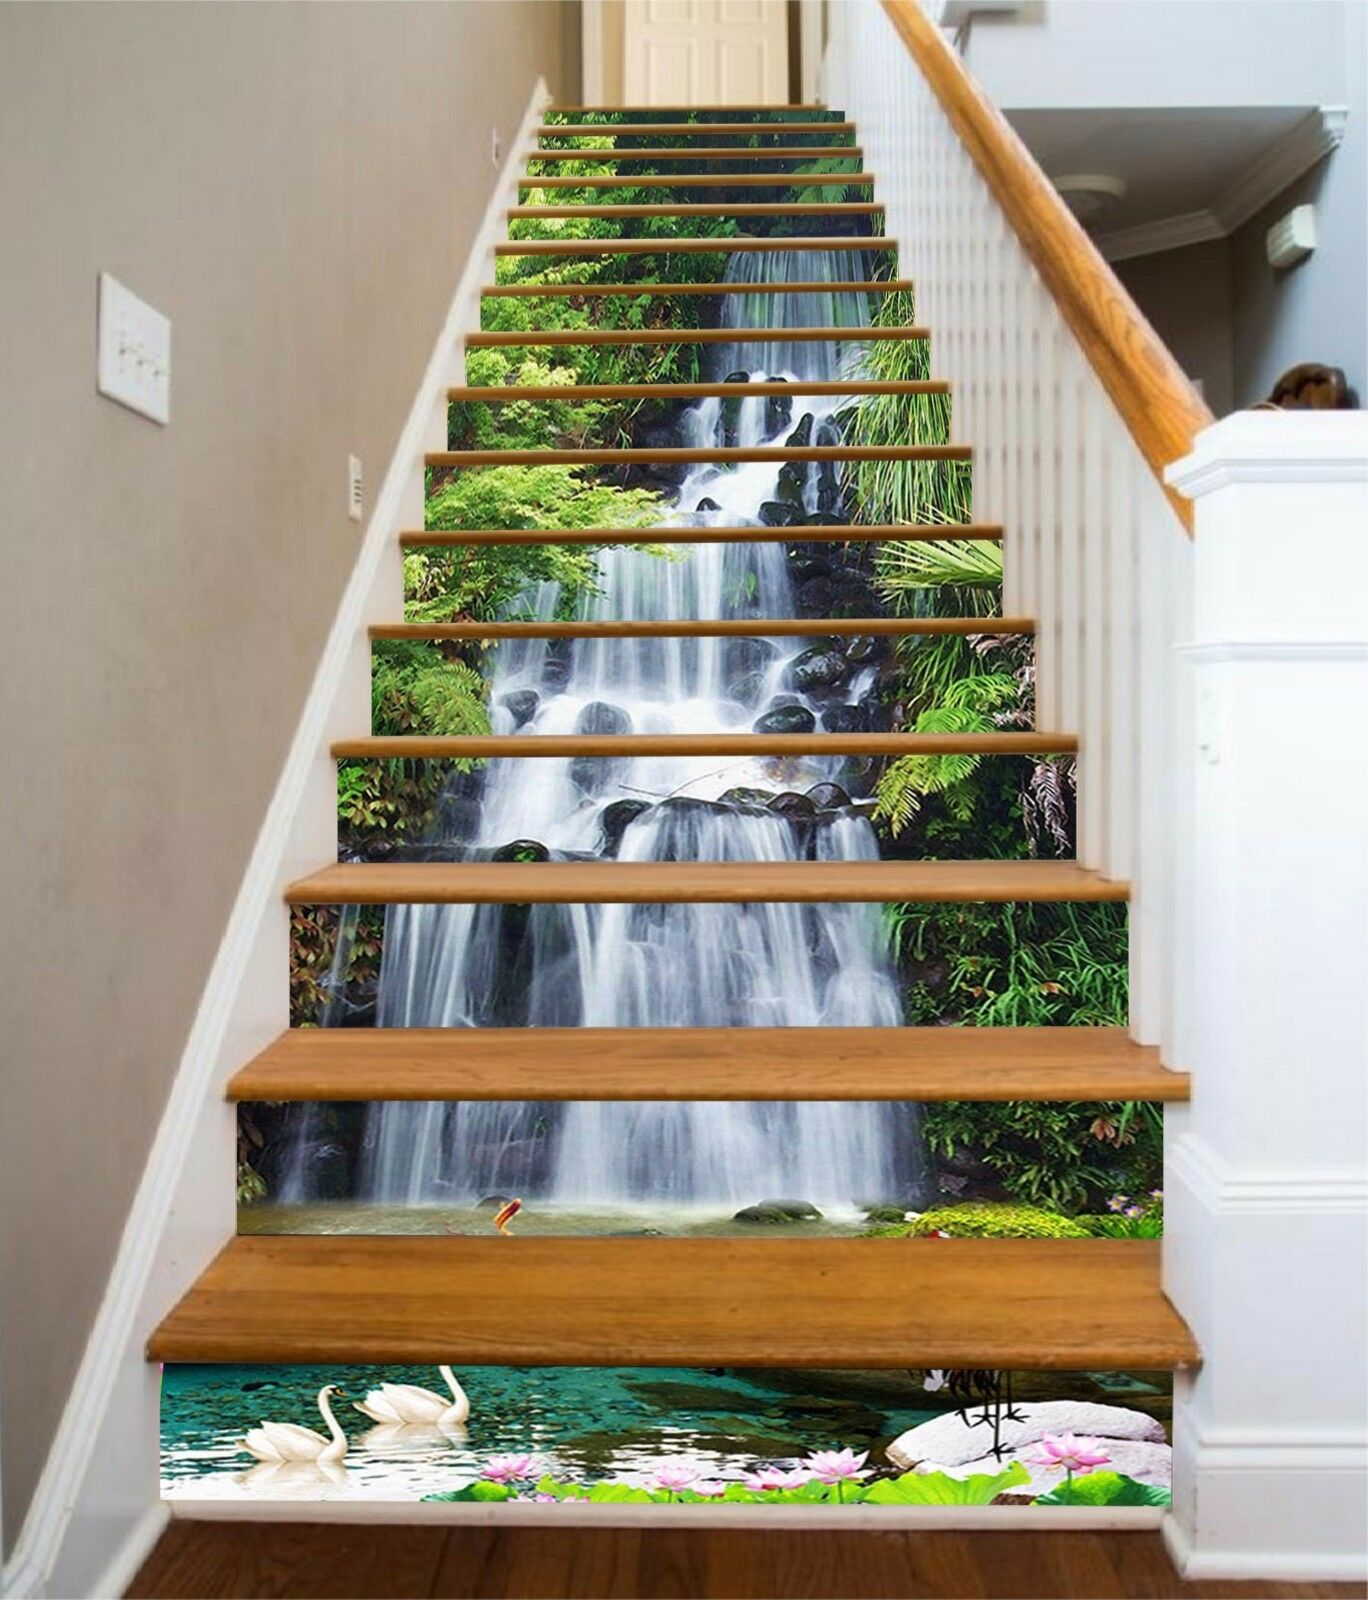 3D Sault Crane 5036 Stair Risers Decoration Photo Mural Vinyl Decal Wallpaper AU